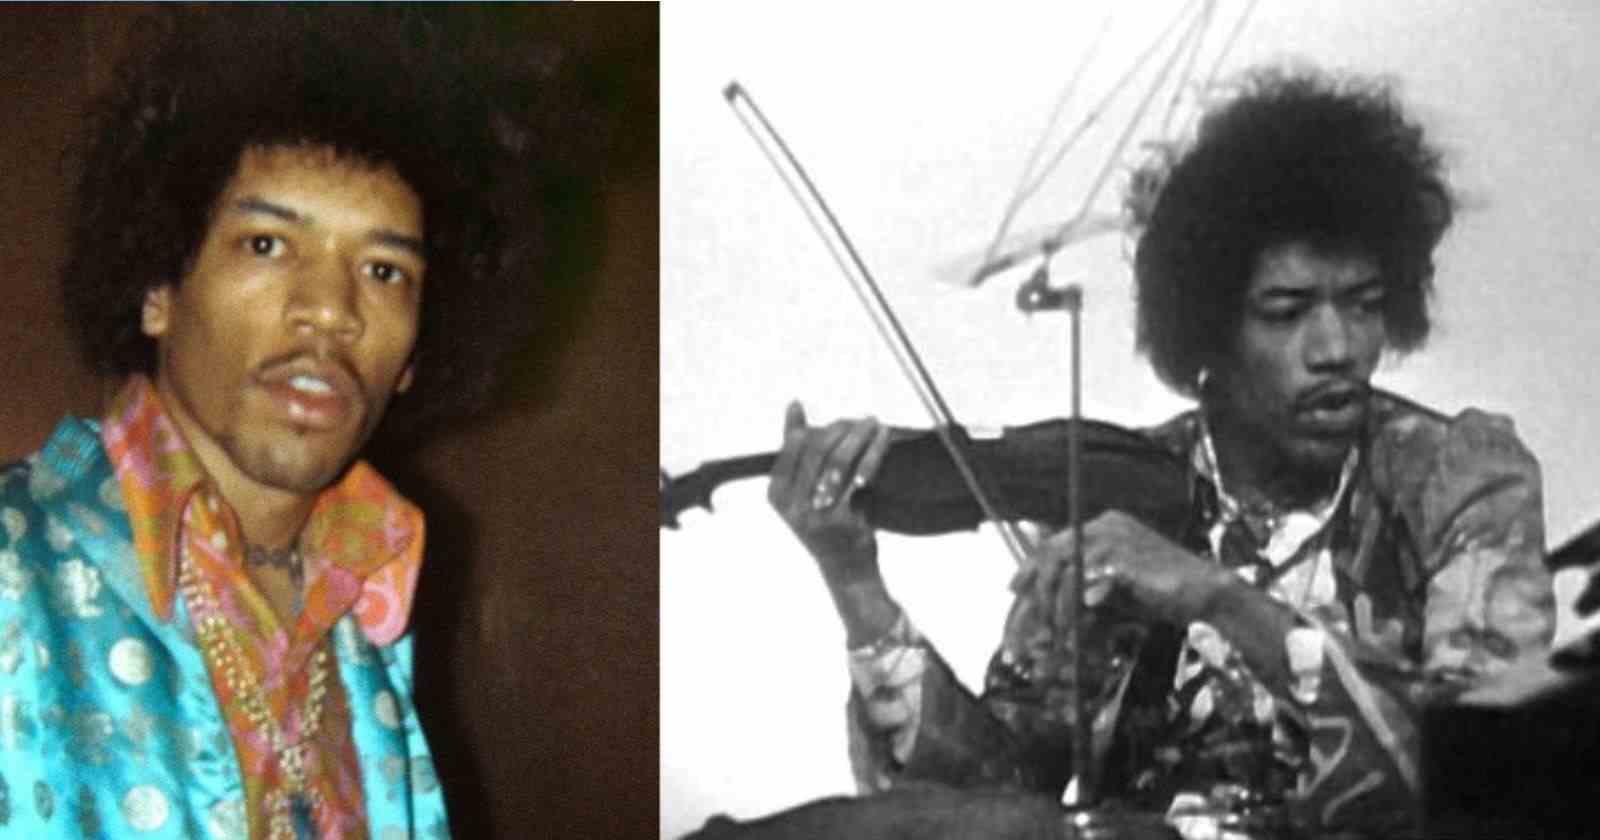 Jimi Hendrix classical music